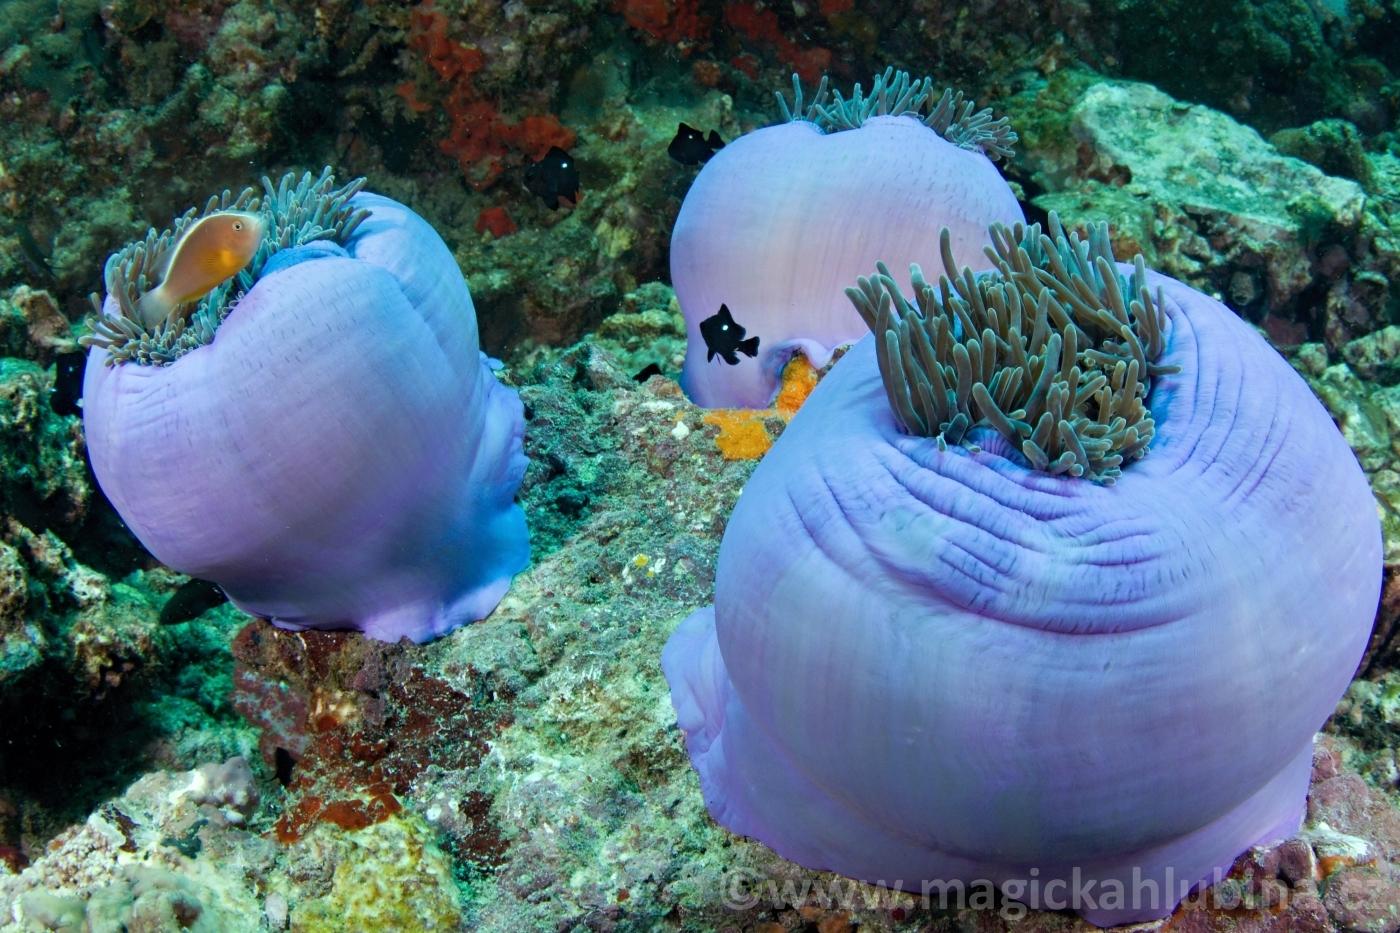 Heteractis_magnifica_-_Ritteri_anemone